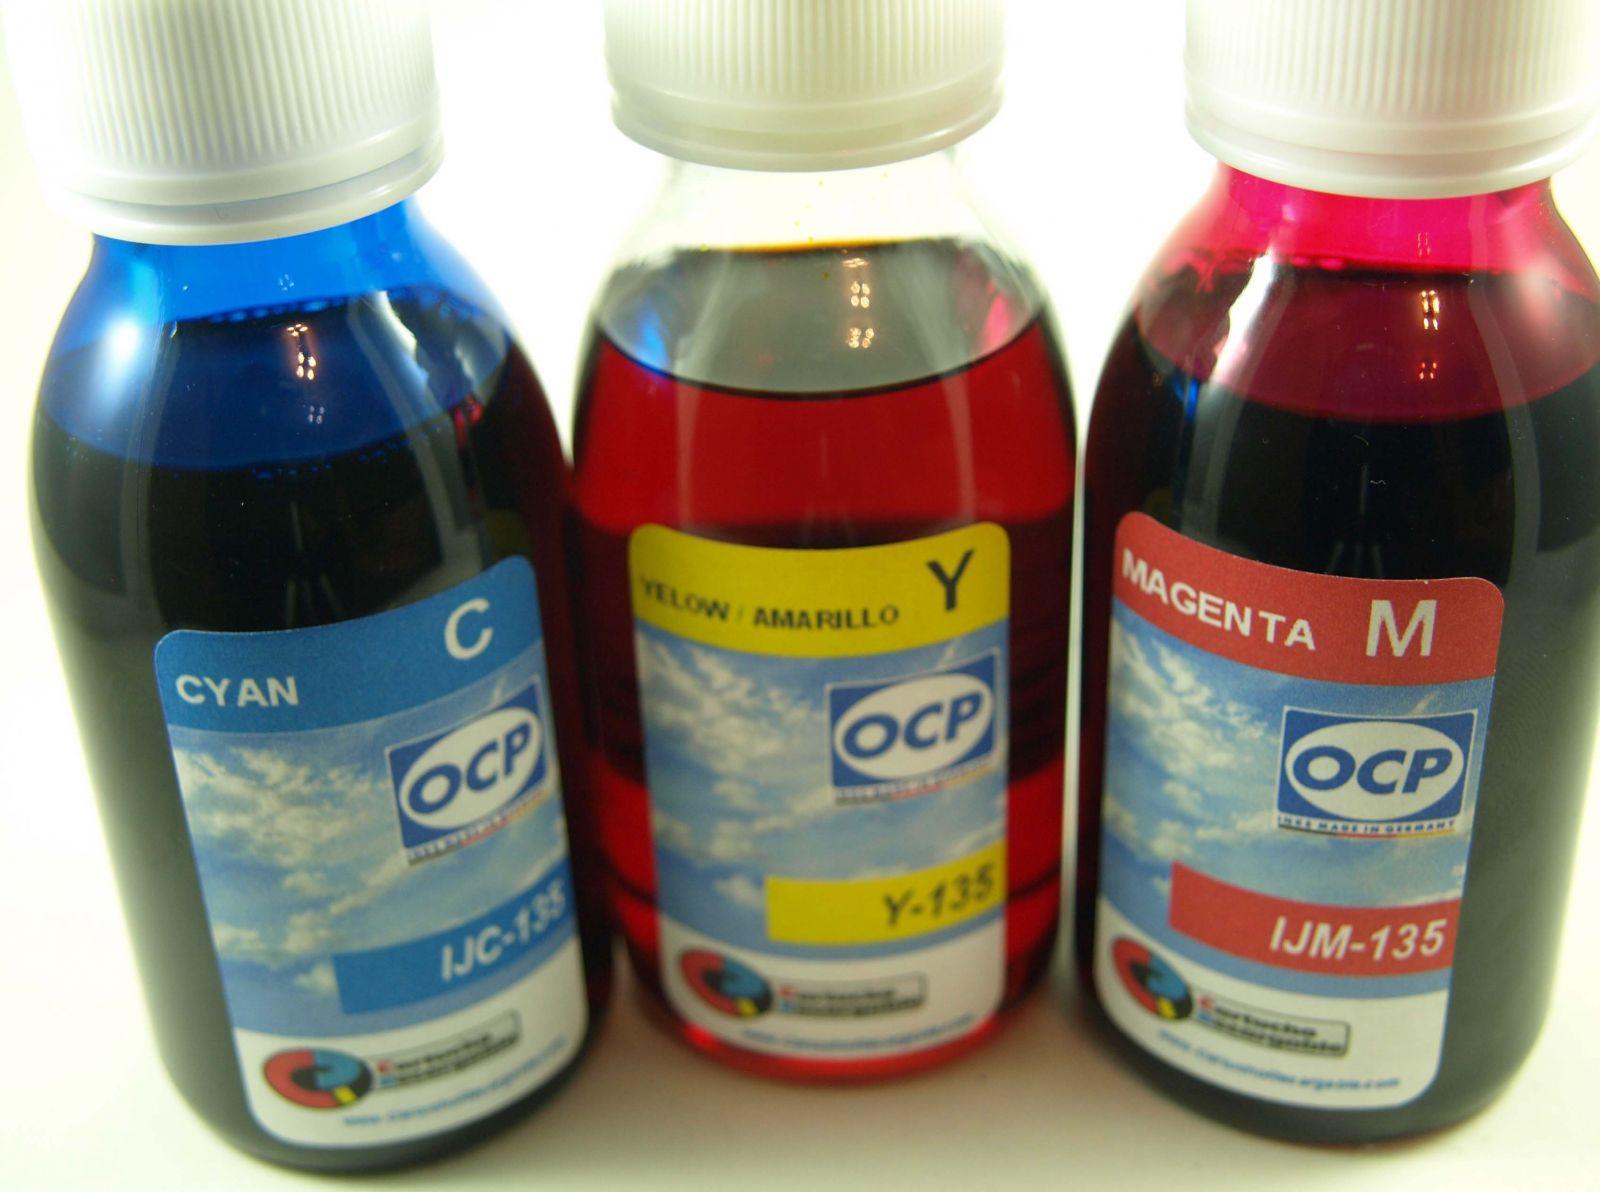 CANON PGI550 PGI570 Y PGI580 / TINTA OCP PARA RECARGA DE CARTUCHOS y CISS CANON Serie PGI550-570 Y 580